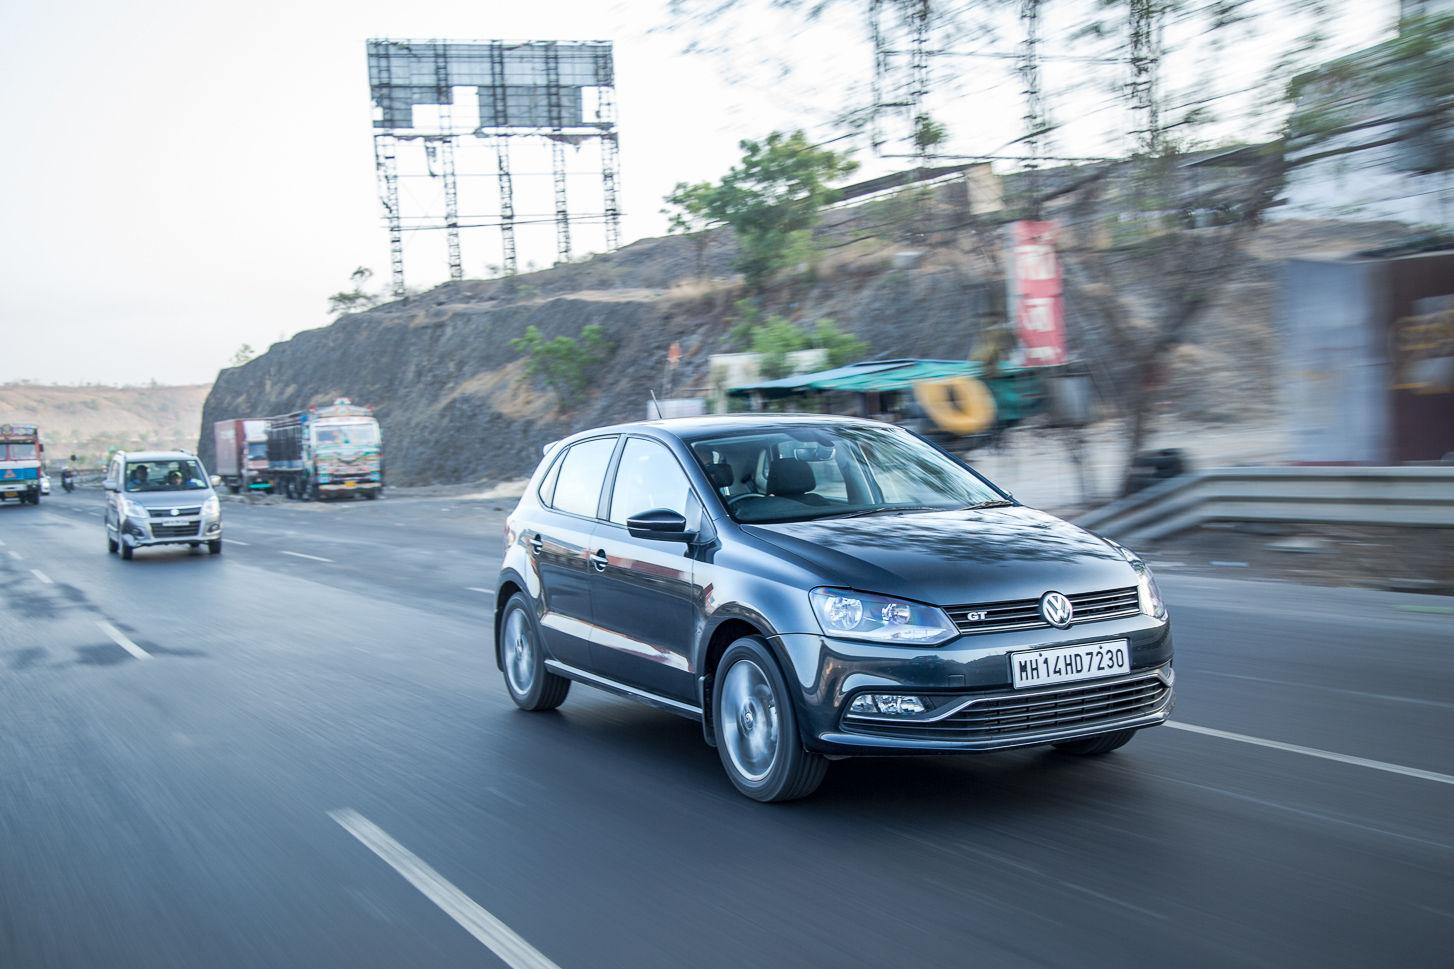 2018 Volkswagen Polo GT TDI: Long Term Report 2: City Commute